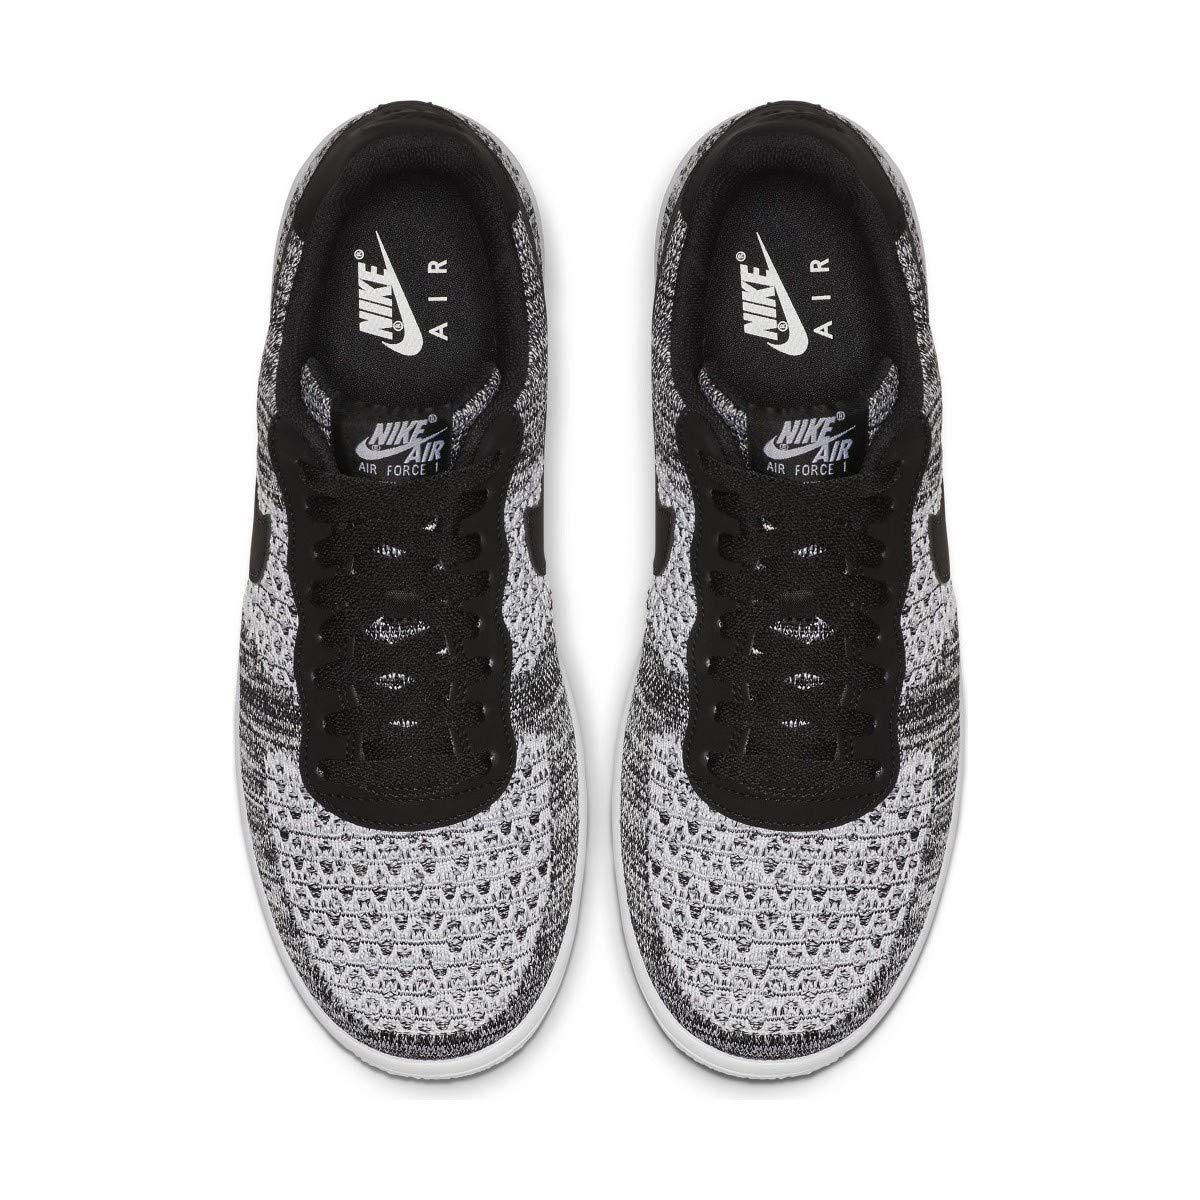 f09bb41f Amazon.com | Nike Air Force 1 Flyknit 2.0 Mens Sneakers AV3042-001, Black/Pure  Platinum-Black-White | Basketball